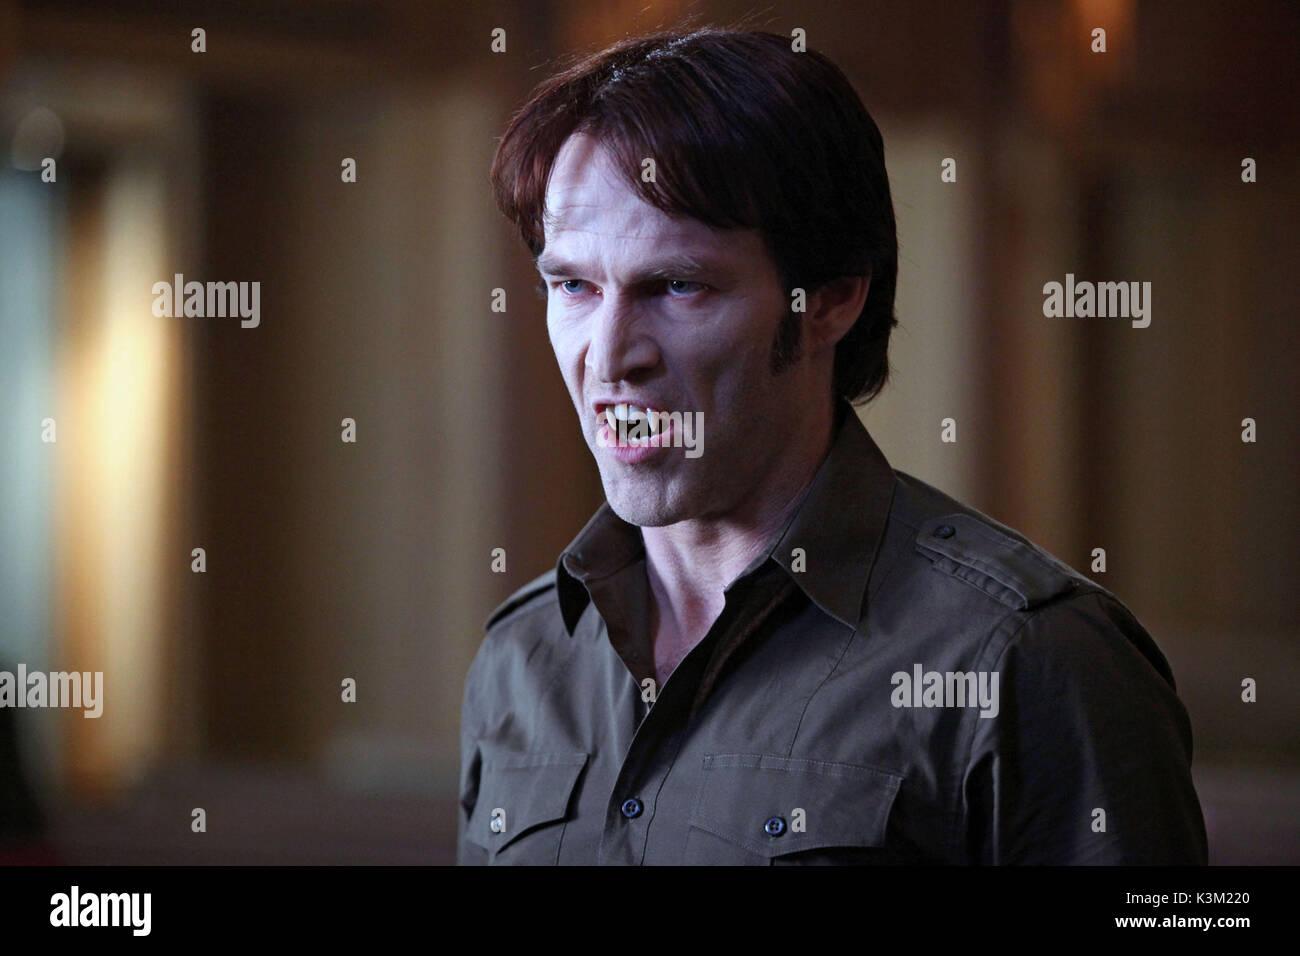 TRUE BLOOD Series,2/Episode,8/Timebomb ALEXANDER SKARSGARD as Eric Northman, STEPHEN MOYER as Bill Compton      - Stock Image